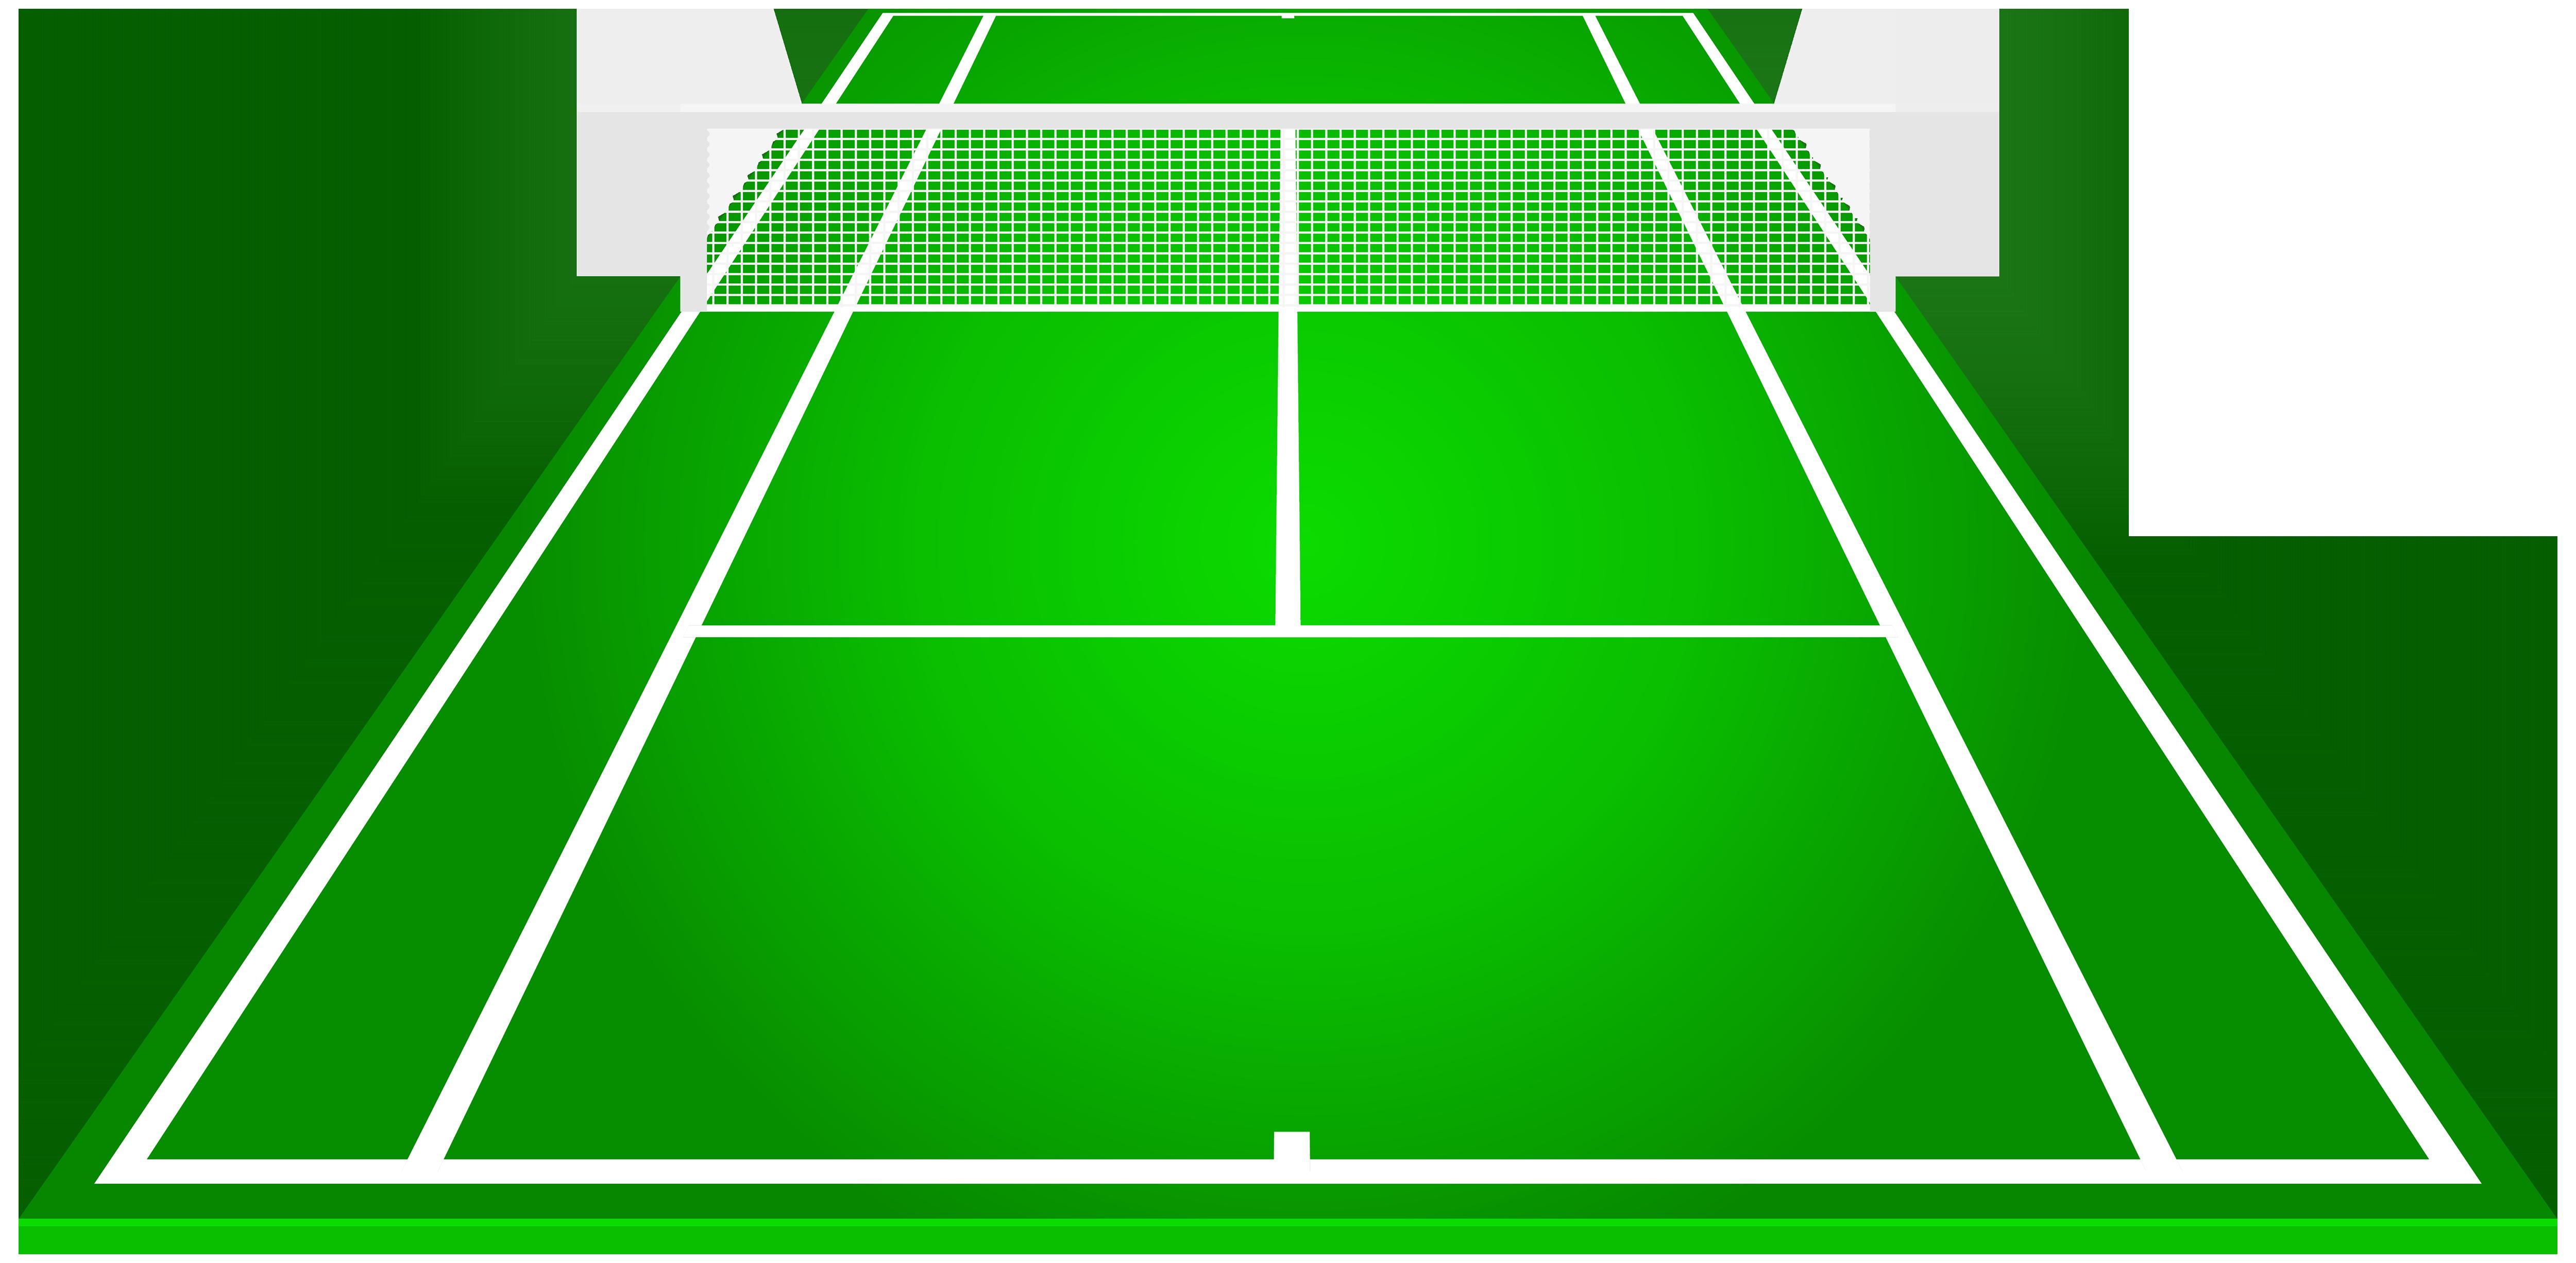 Court png best web. Cup clipart tennis